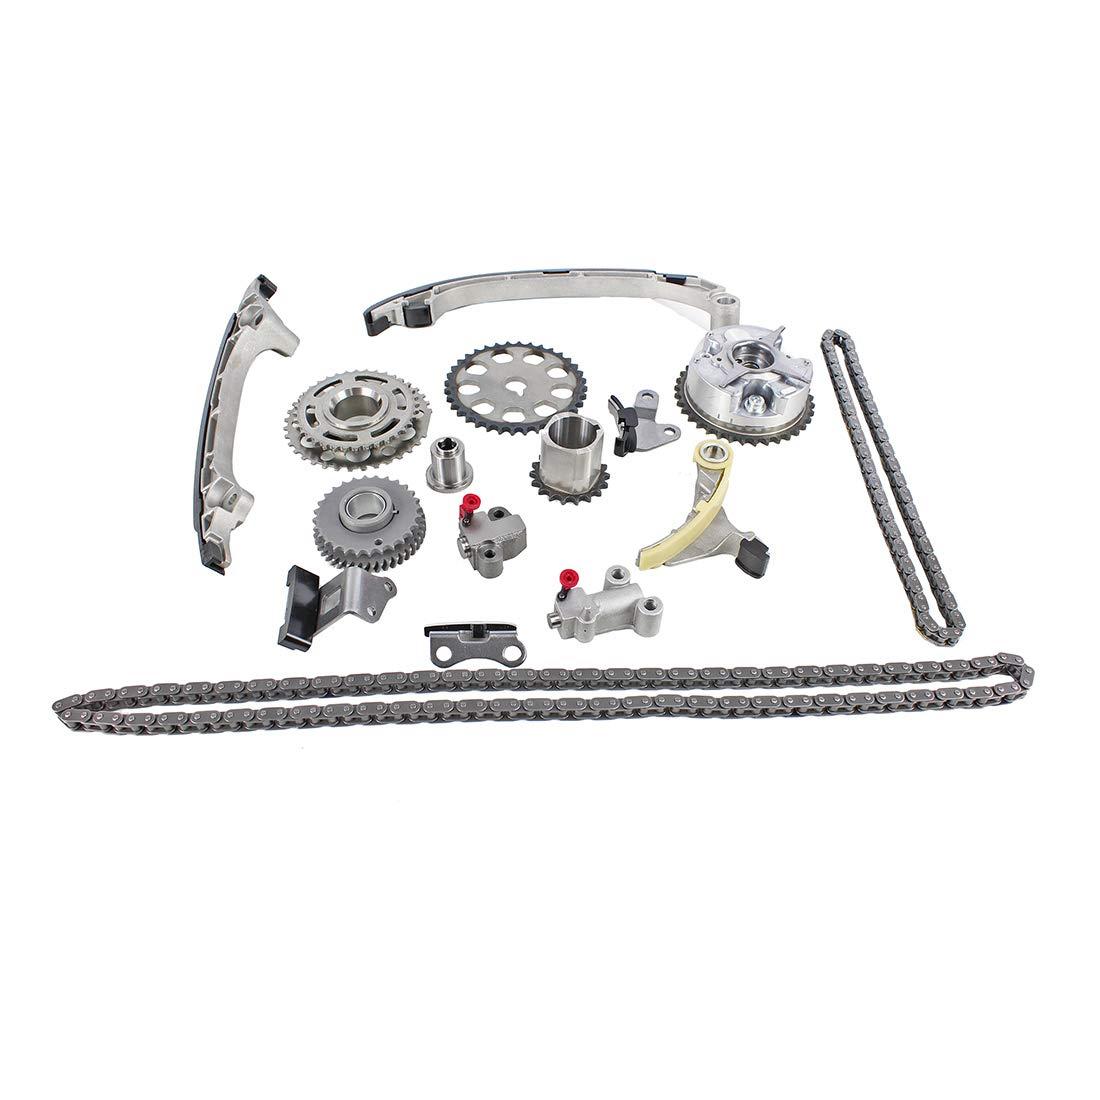 DNJ TK954VVT Timing Chain Kit for 2005-2015 L4 DOHC Toyota 2.7L Tacoma 2694cc 16V 4Runner 2TRFE